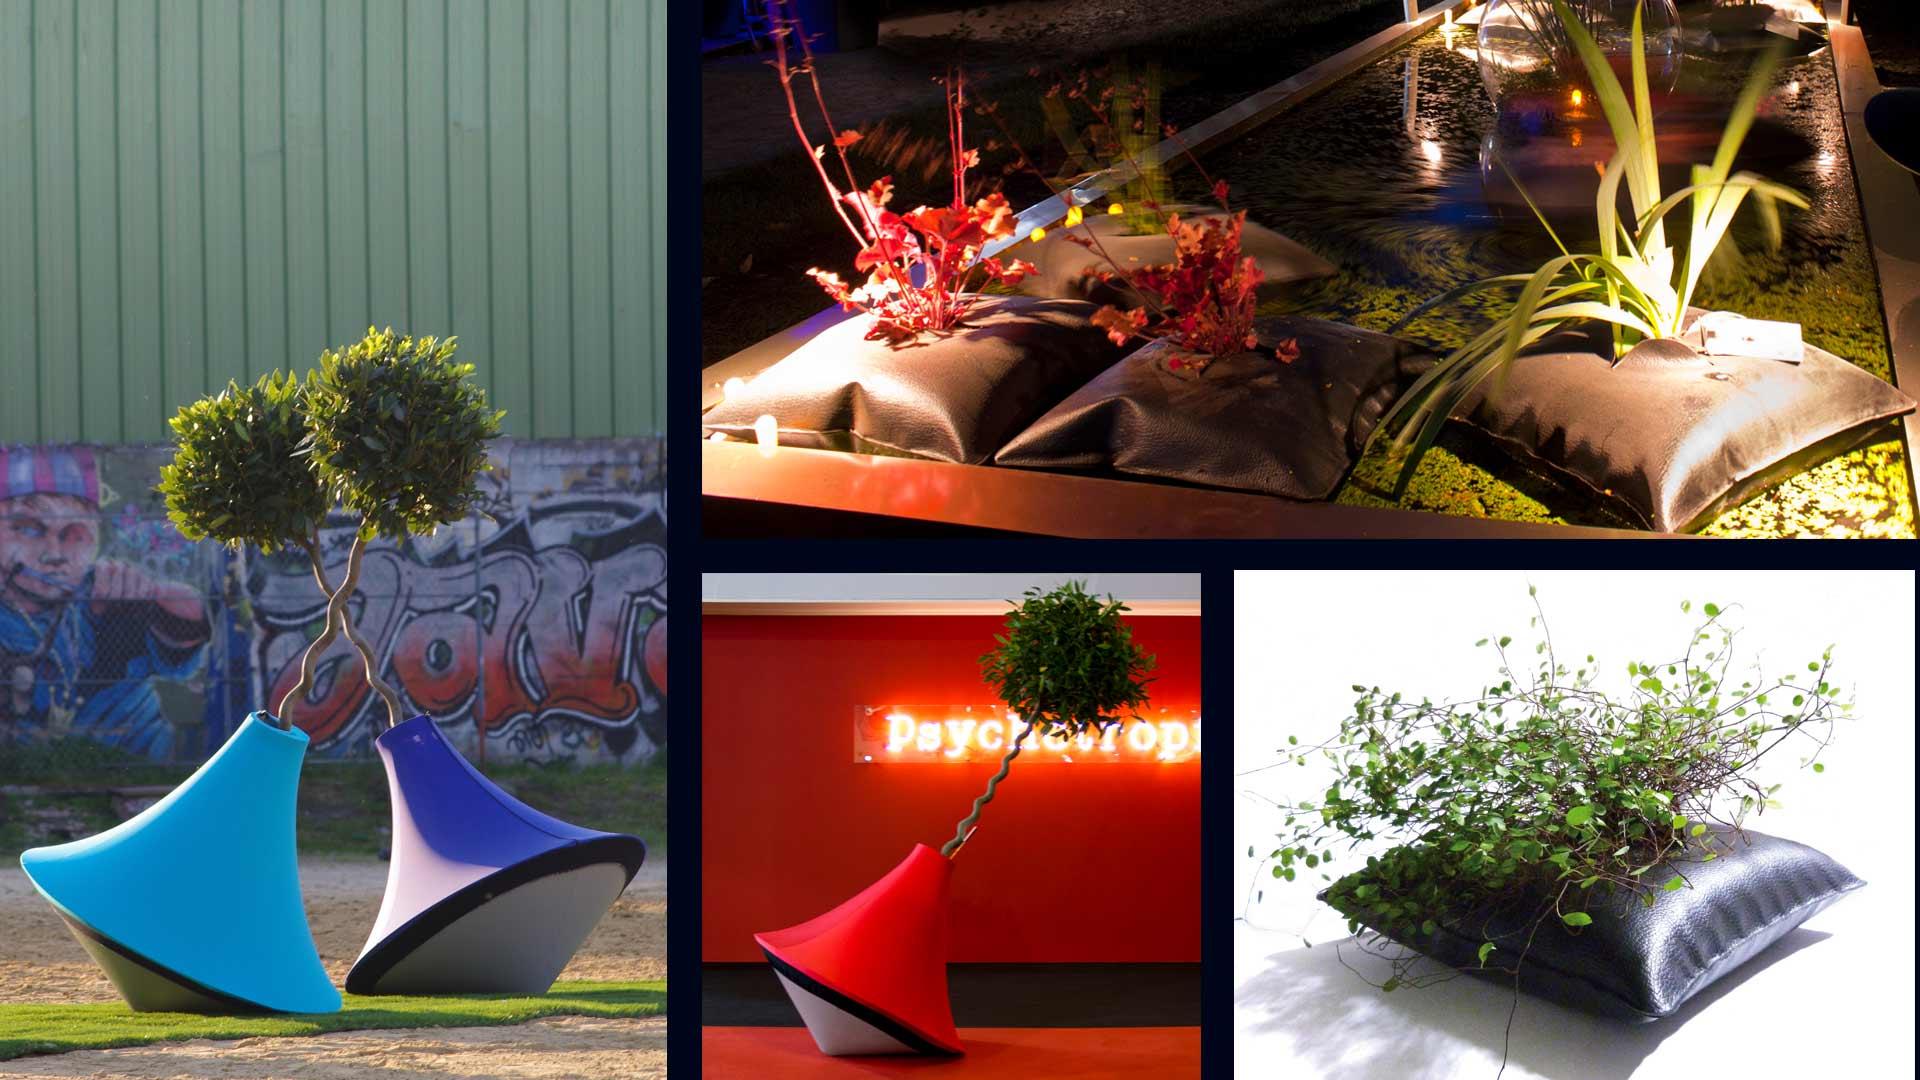 Design jardiniere Alexis tricoire